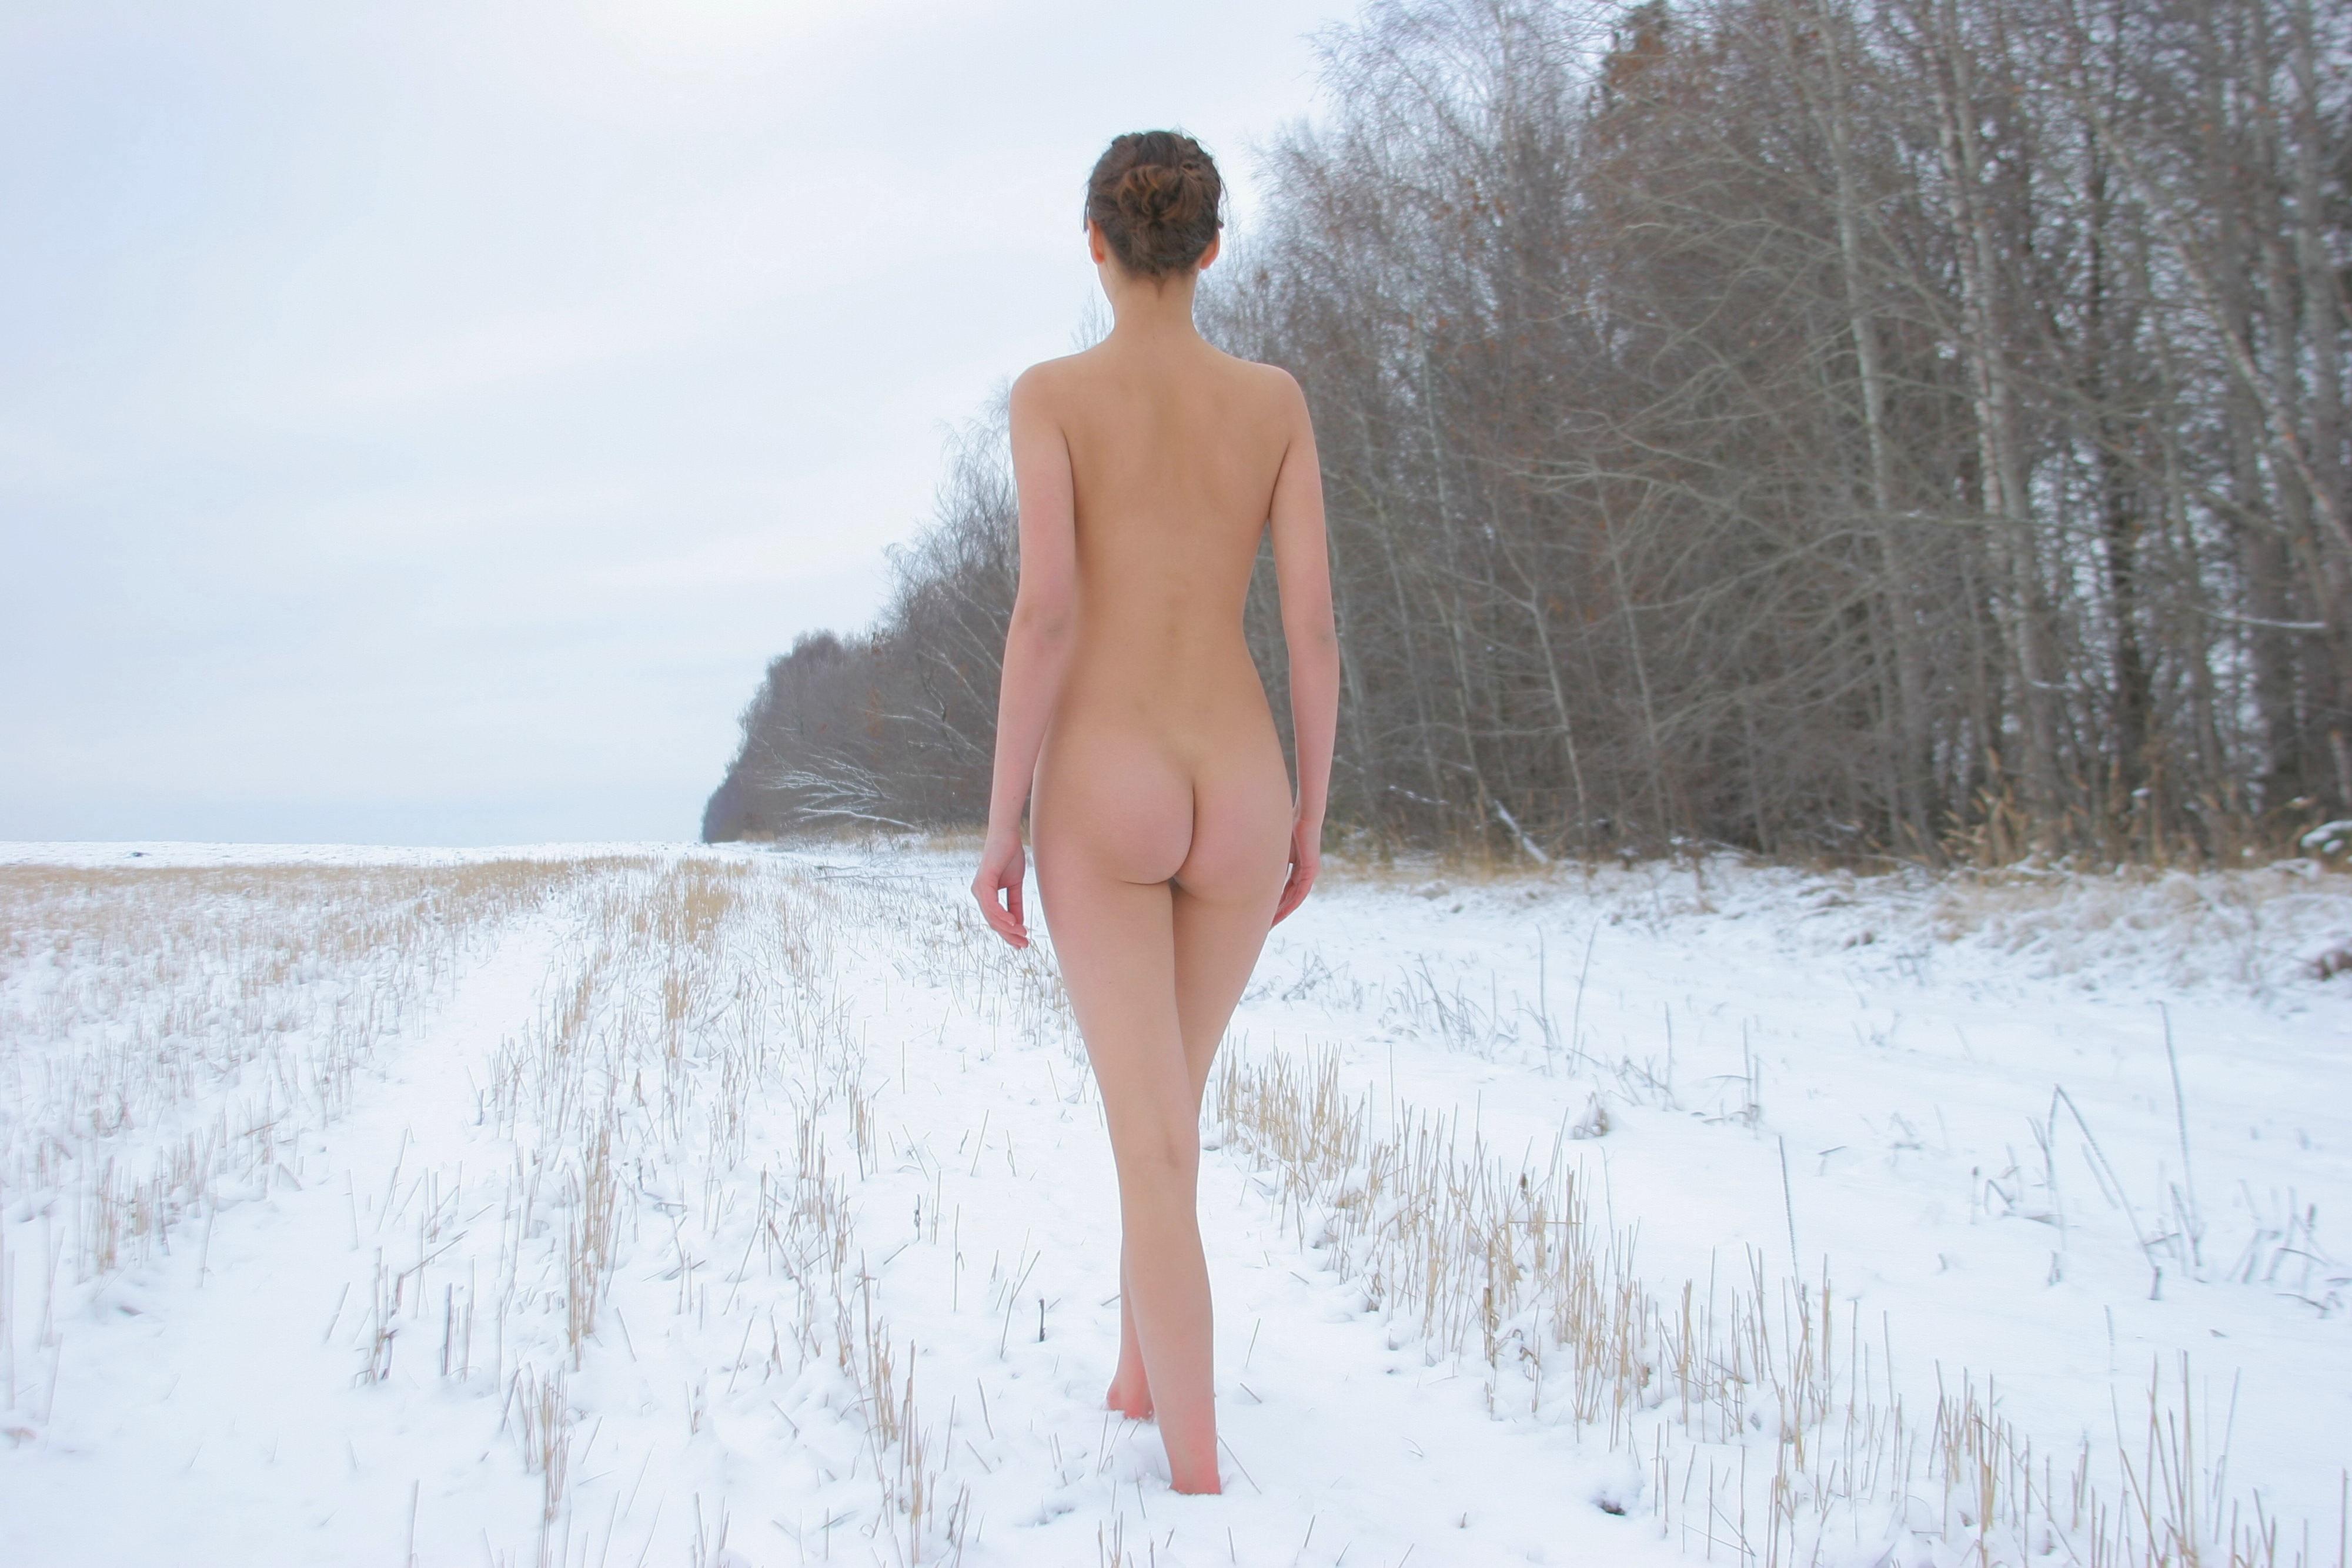 golie-devki-v-snegu